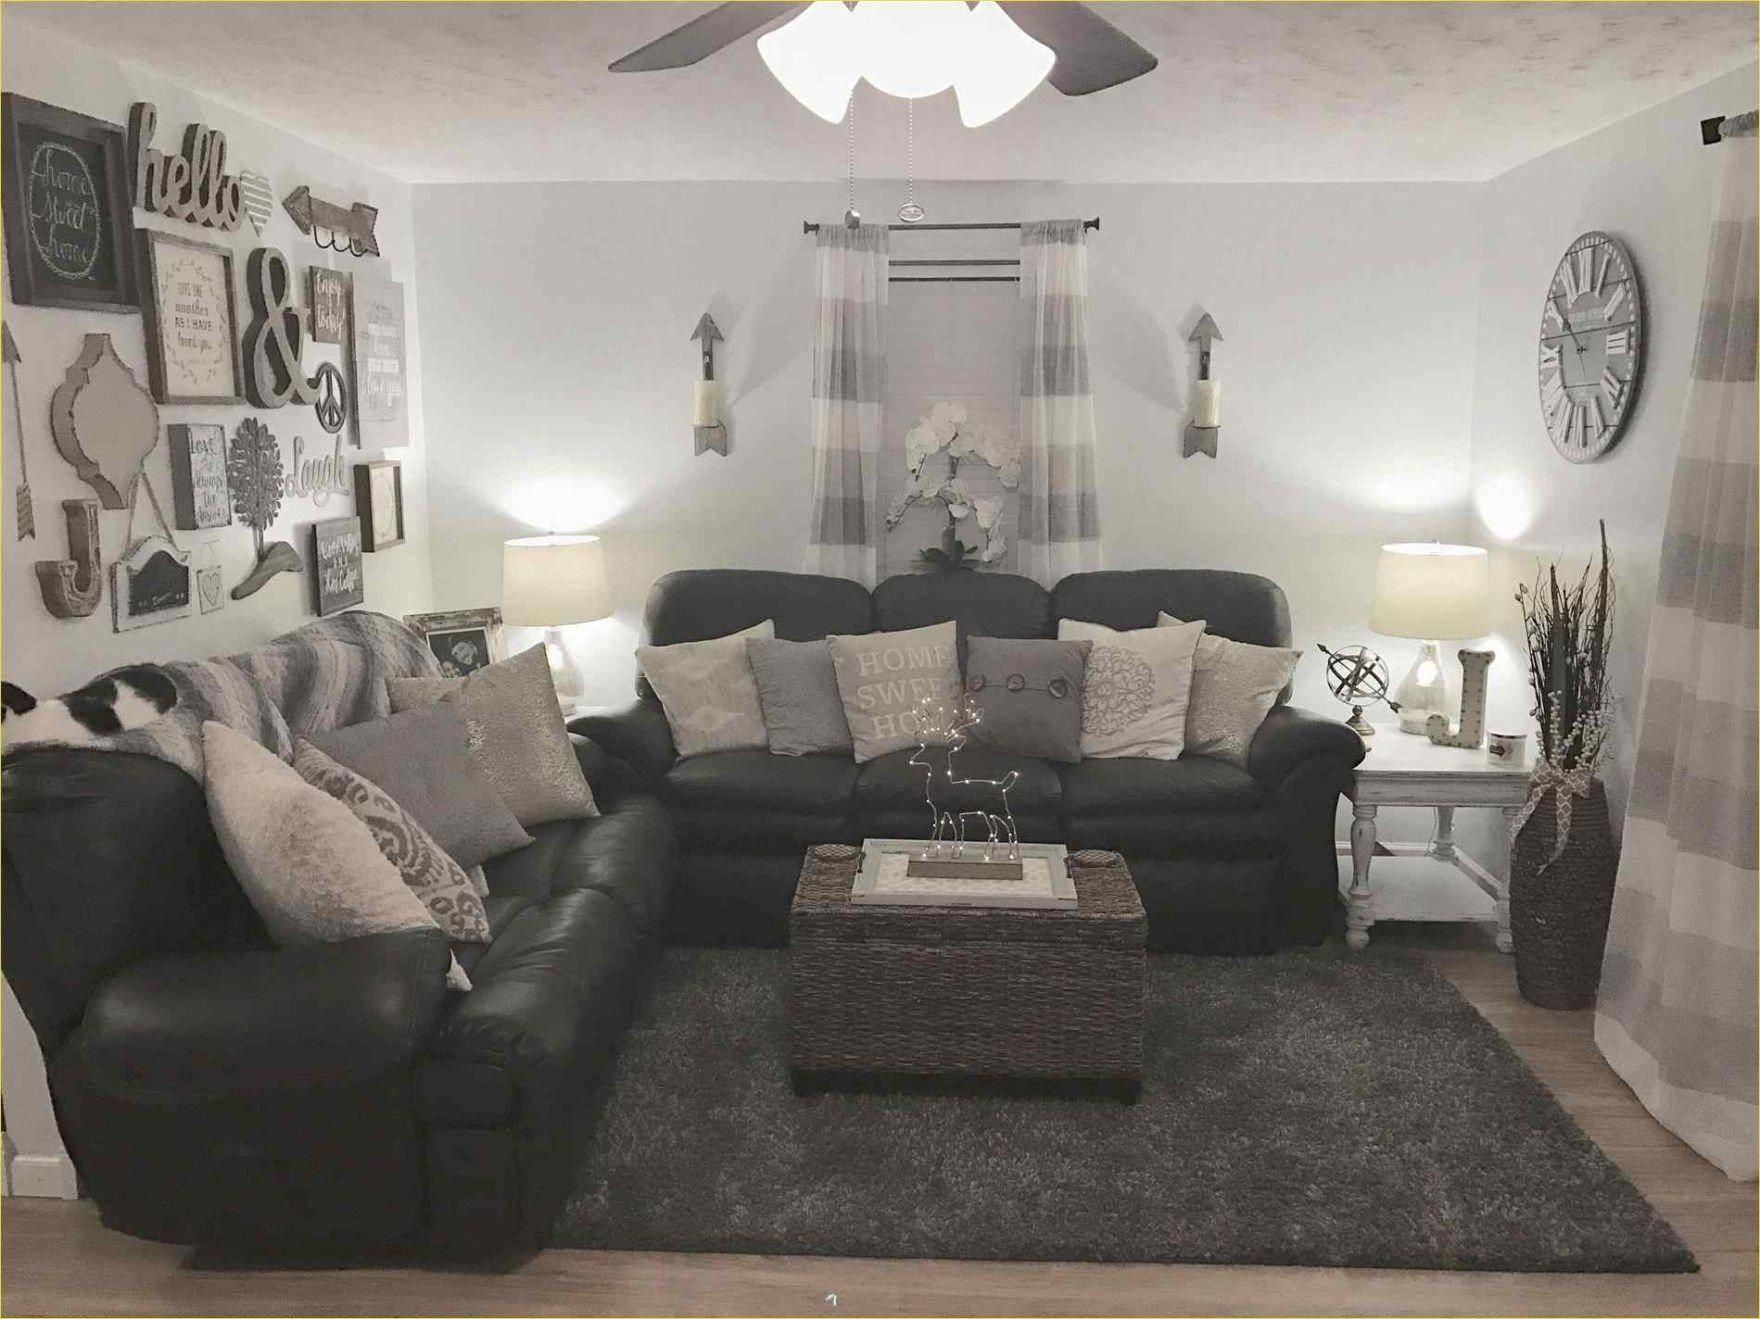 39+ Farmhouse decorating with leather sofa ideas